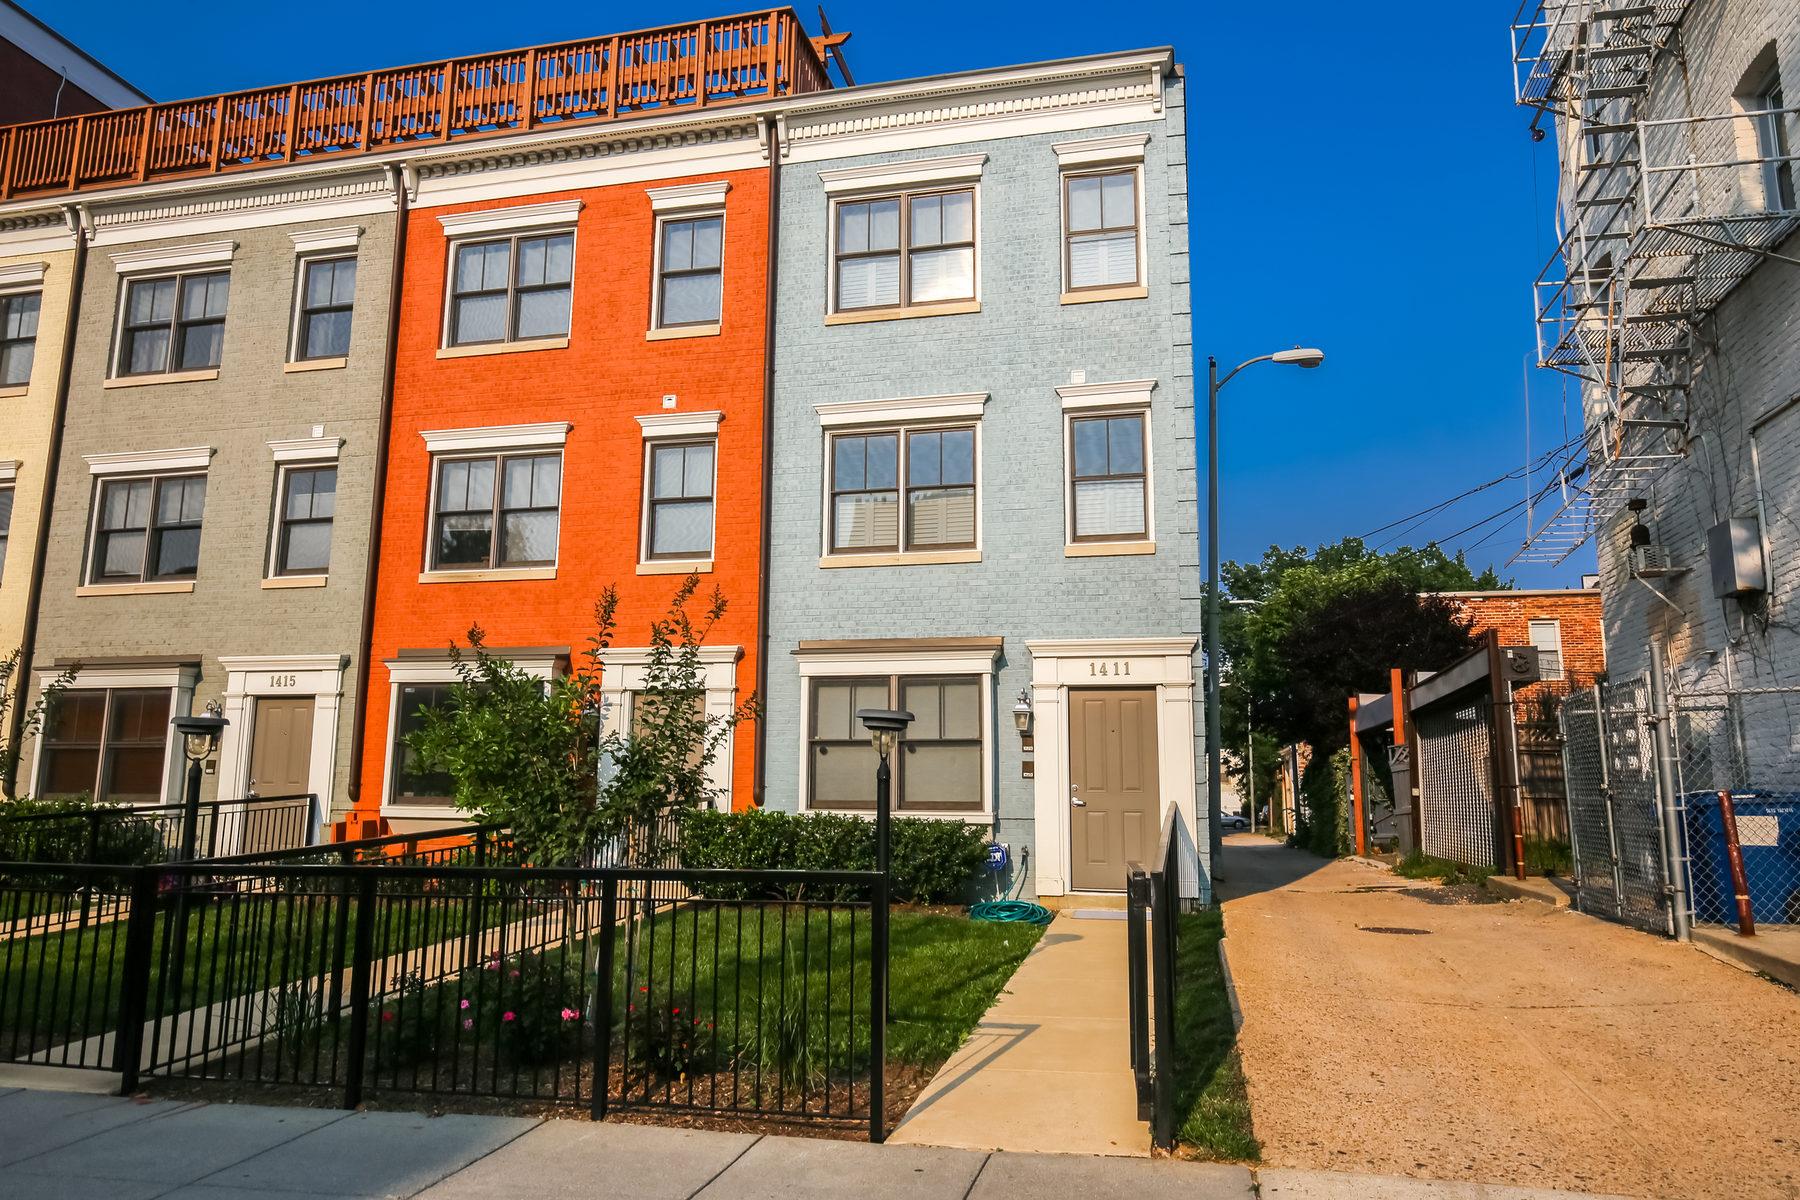 Condominium for Sale at 1411 11th Street Nw A, Washington Washington, District Of Columbia 20001 United States